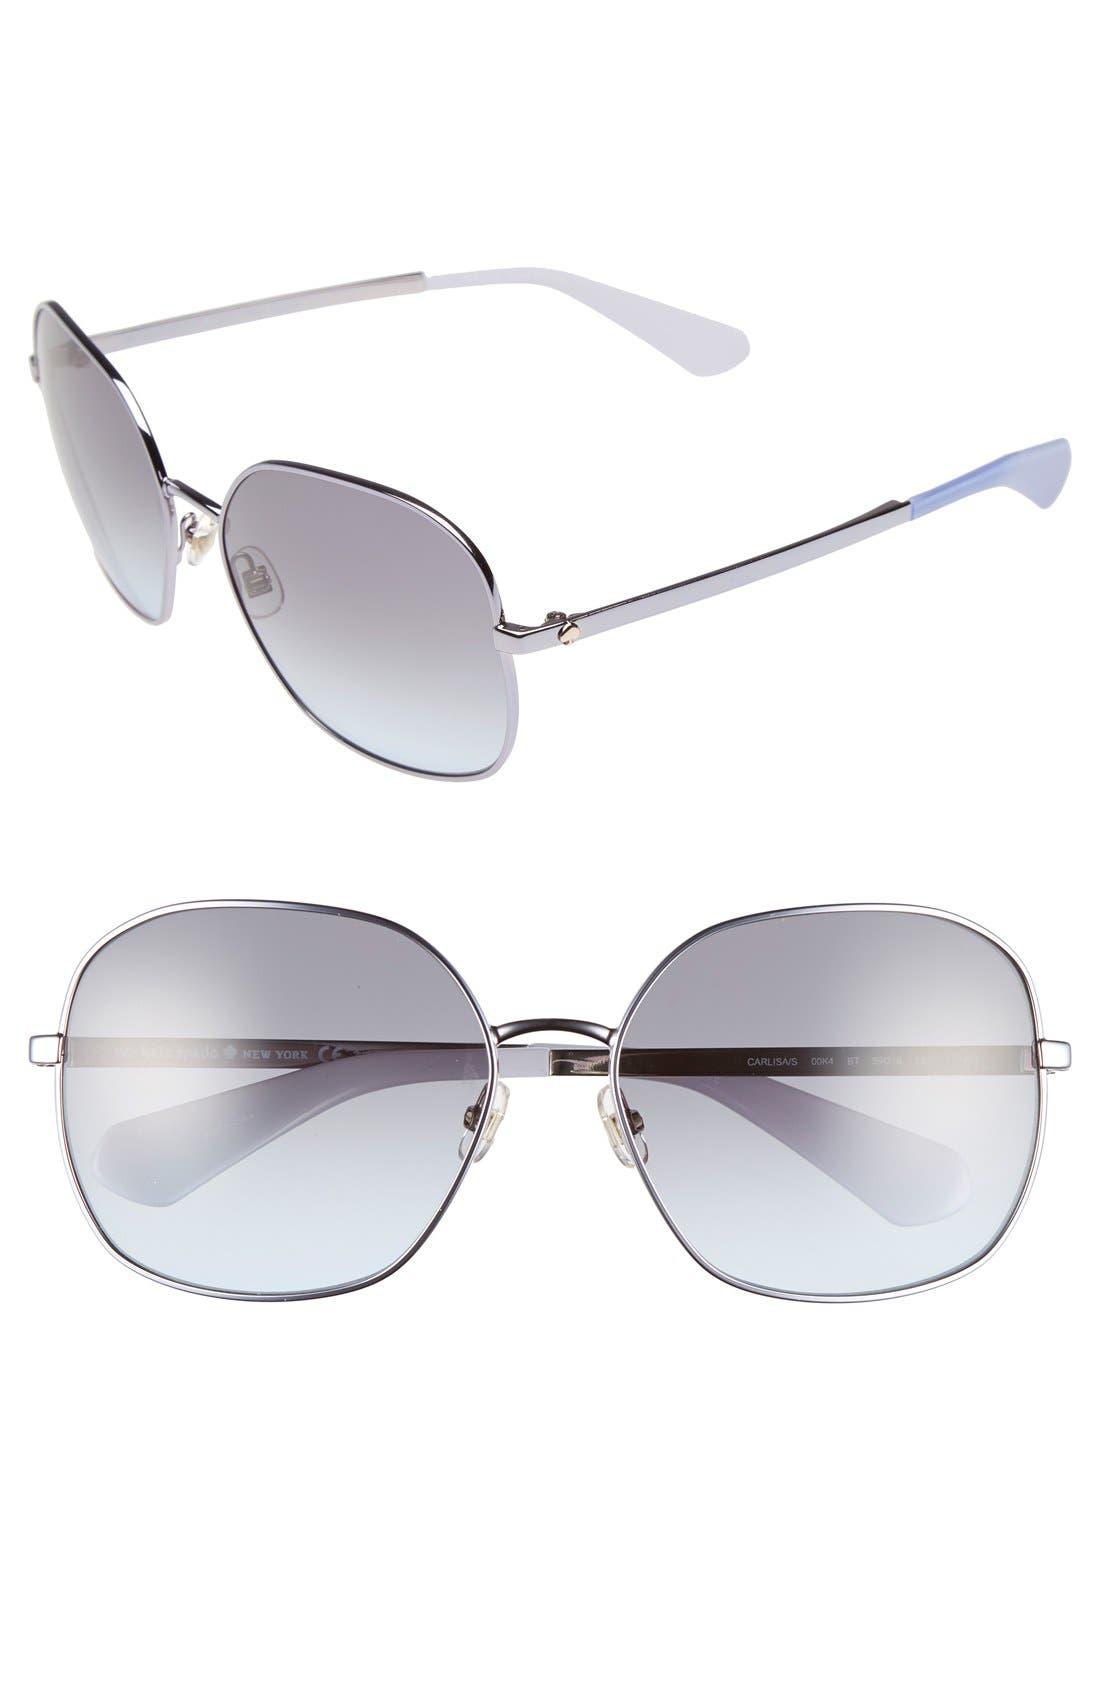 Main Image - kate spade new york 'carlisa' 59mm sunglasses